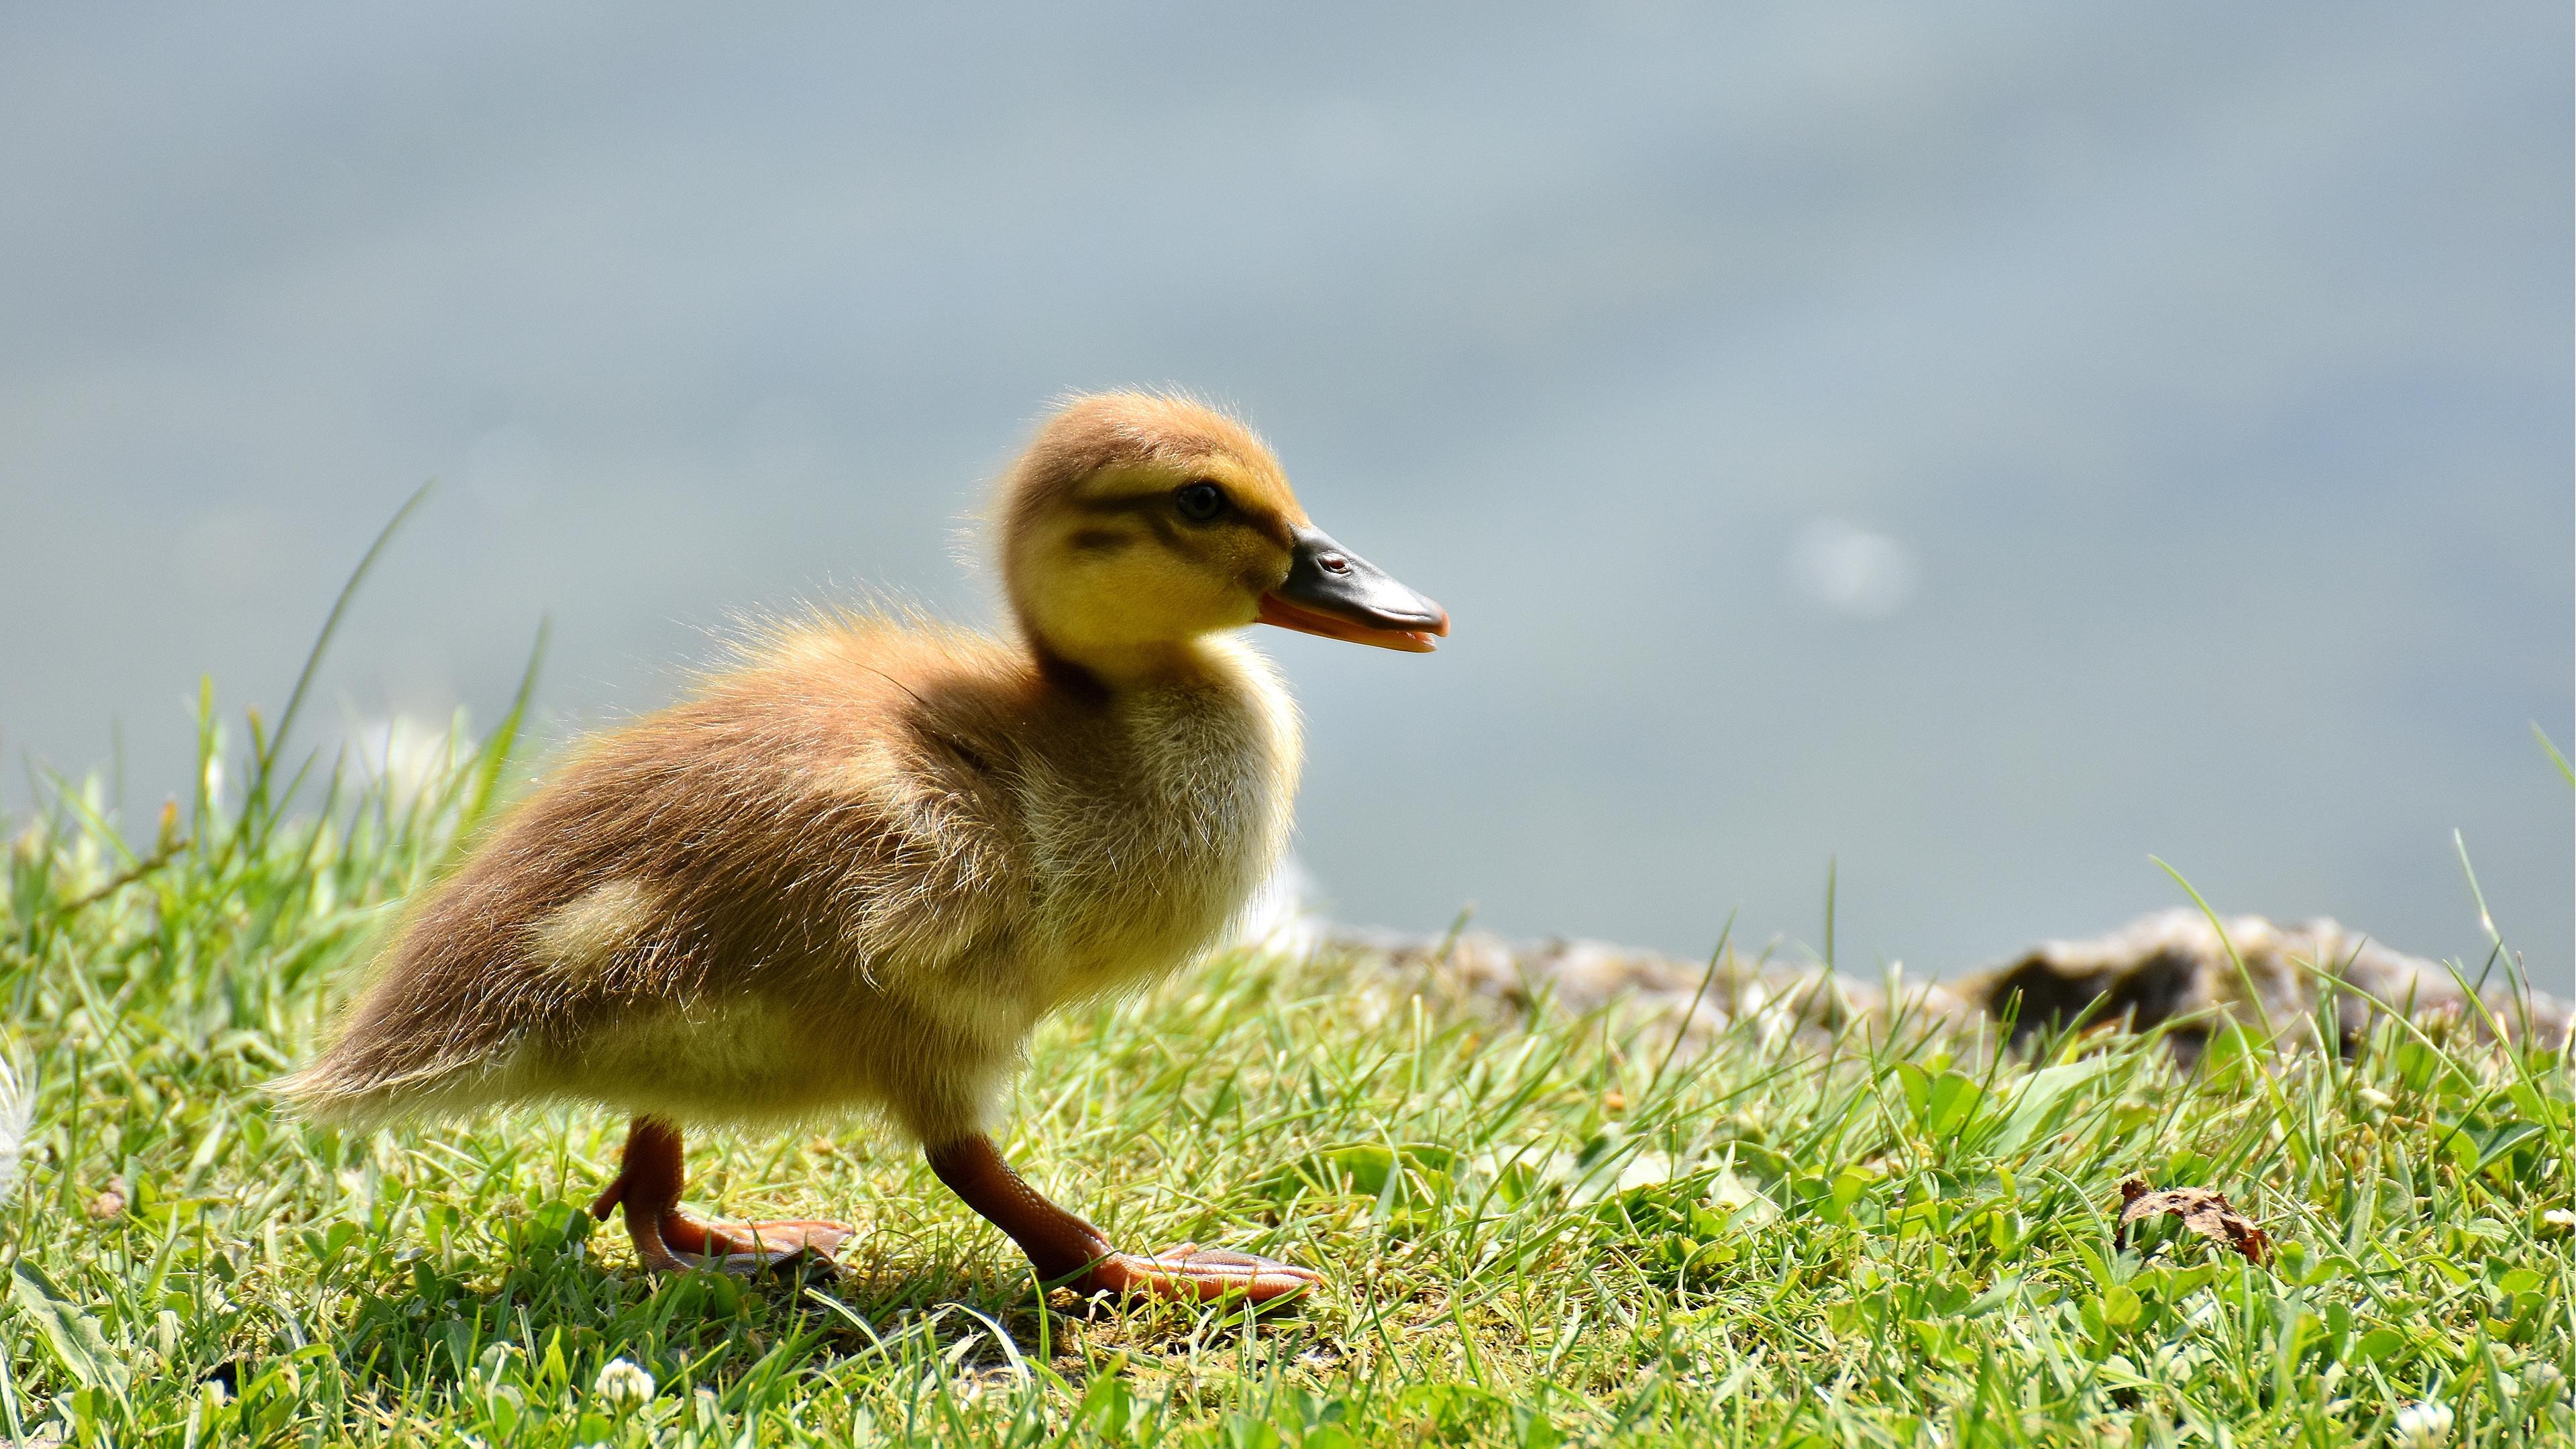 Res: 3840x2160, Little Baby Duck ChromeBook Wallpaper